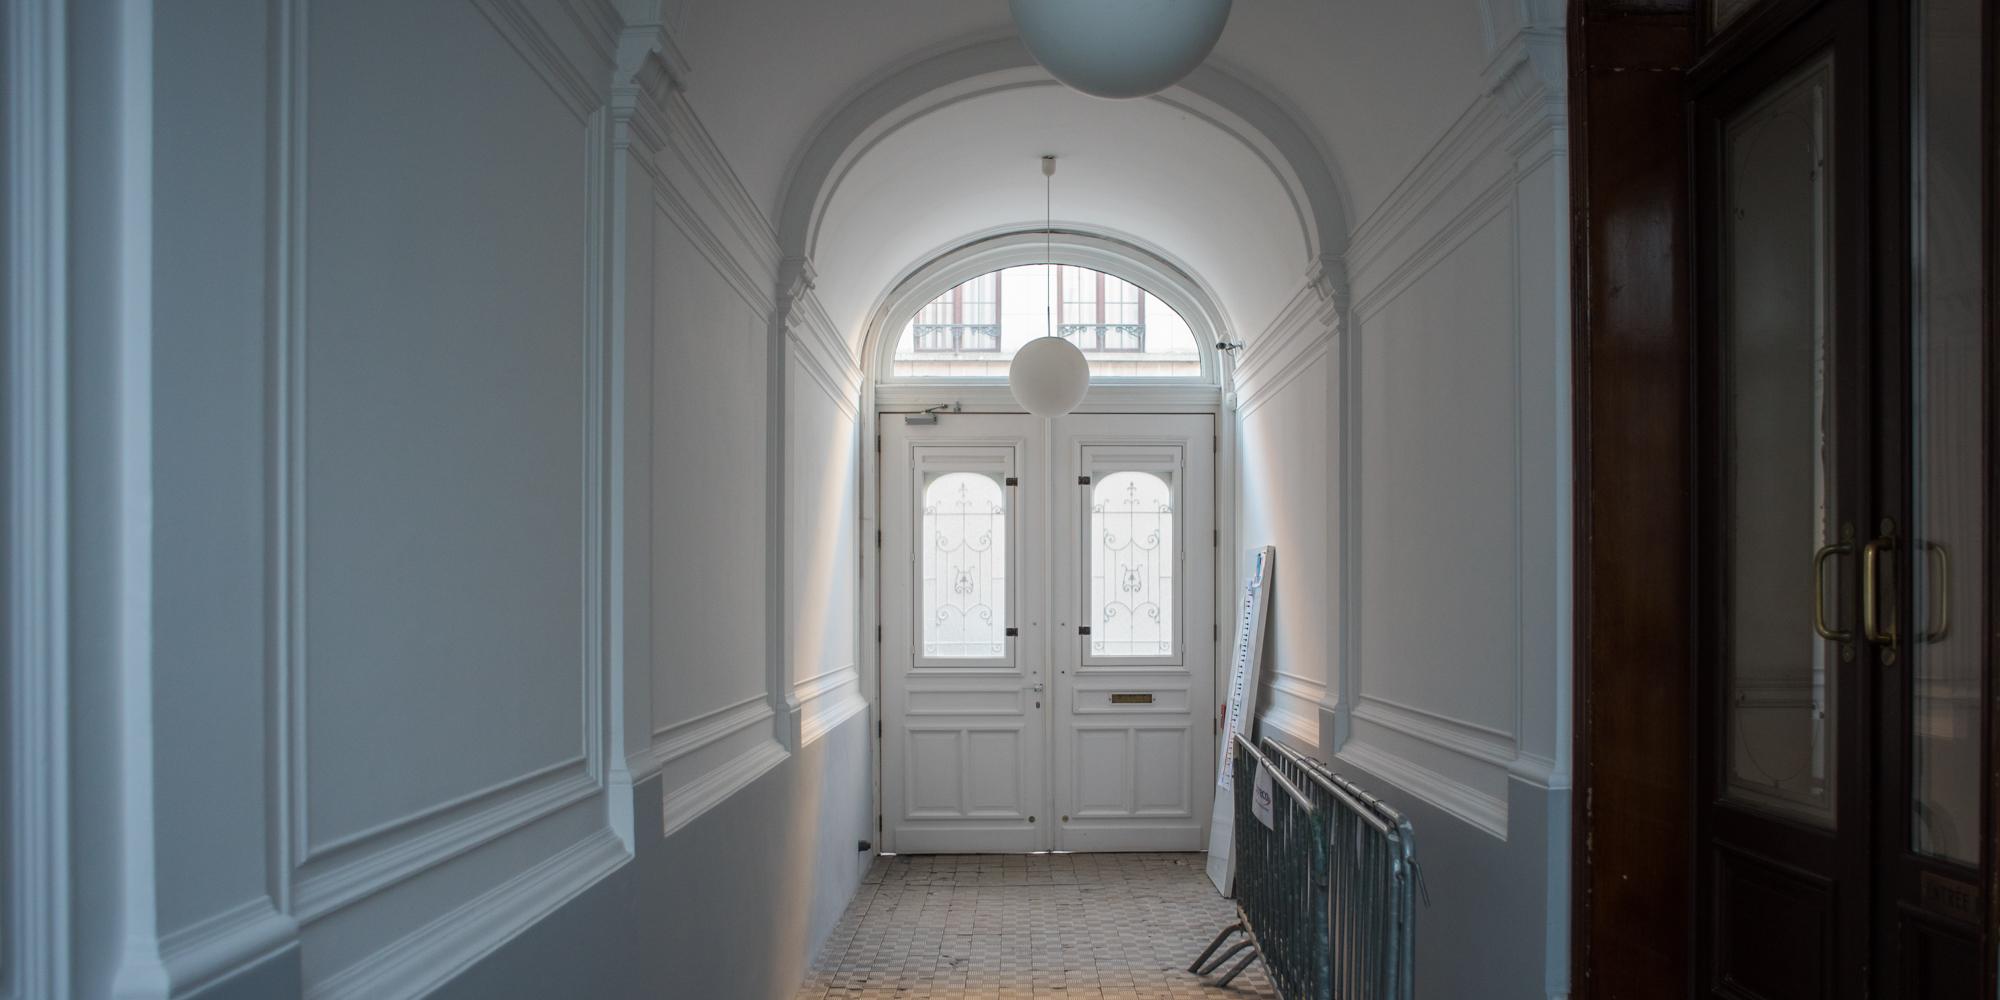 Namahn building entrance